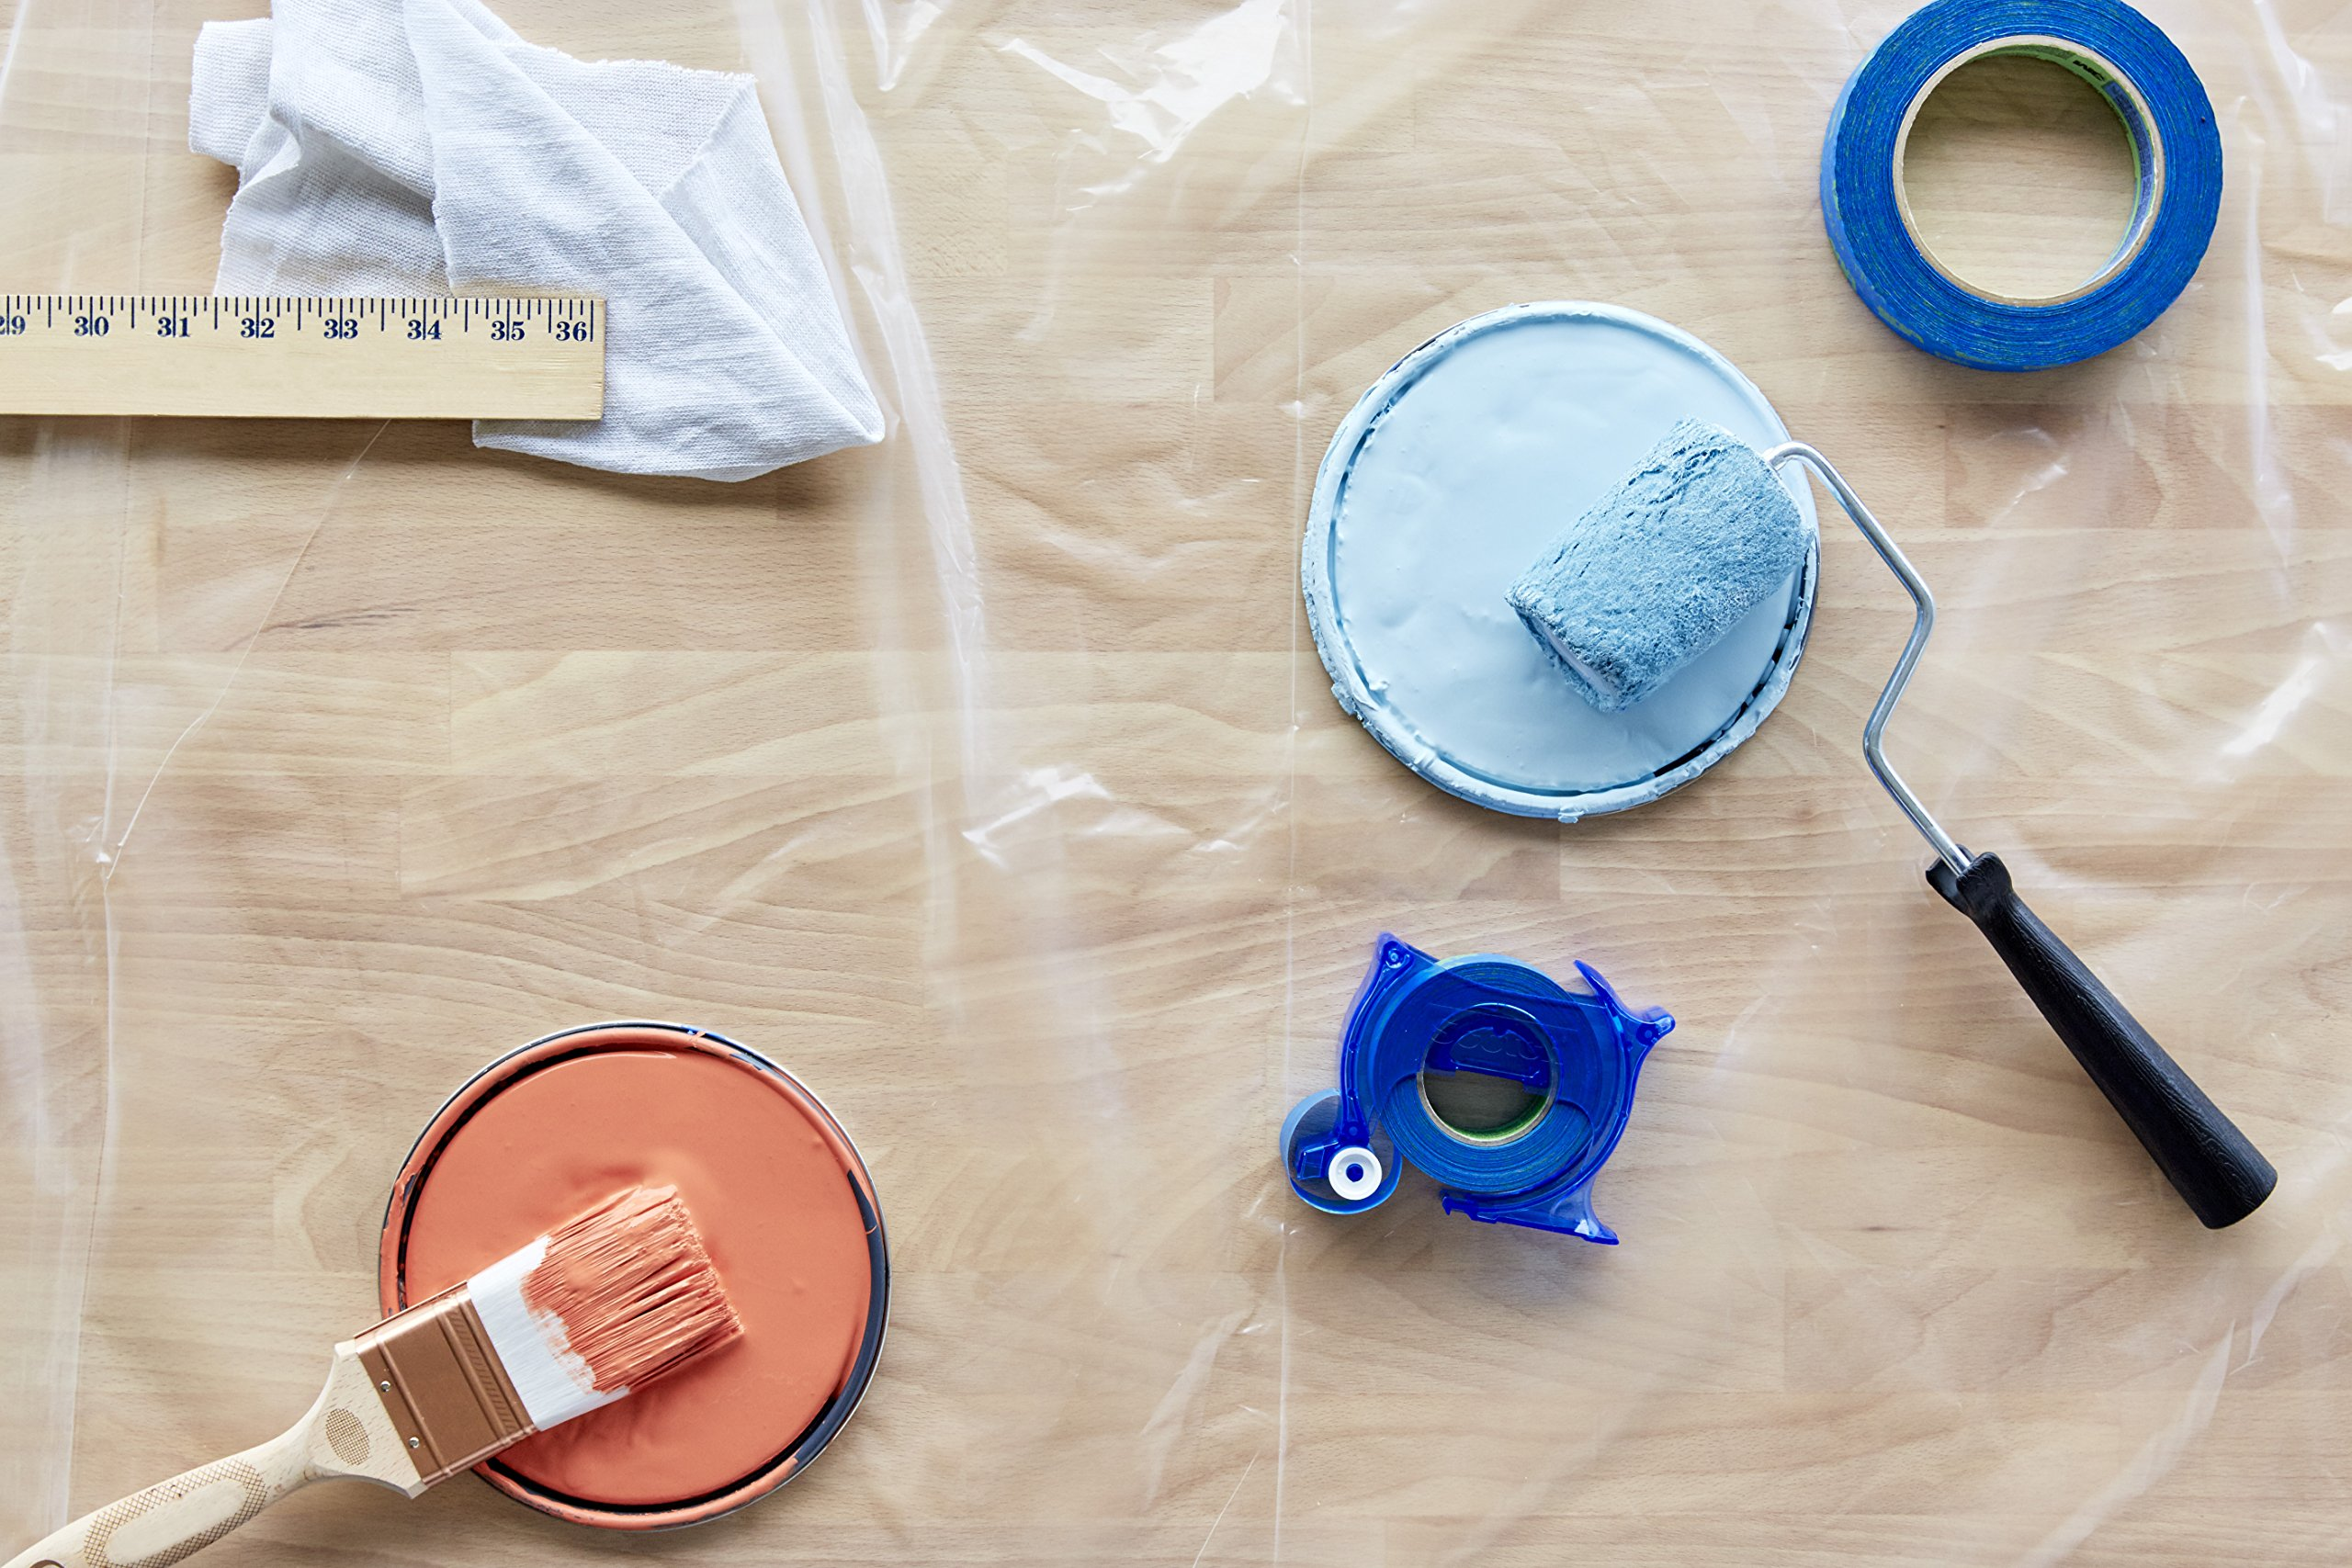 ScotchBlue TRIM + BASEBOARDS Painter's Tape Applicator, 1-Inch x 25-Yards, 1 Roll by ScotchBlue (Image #5)